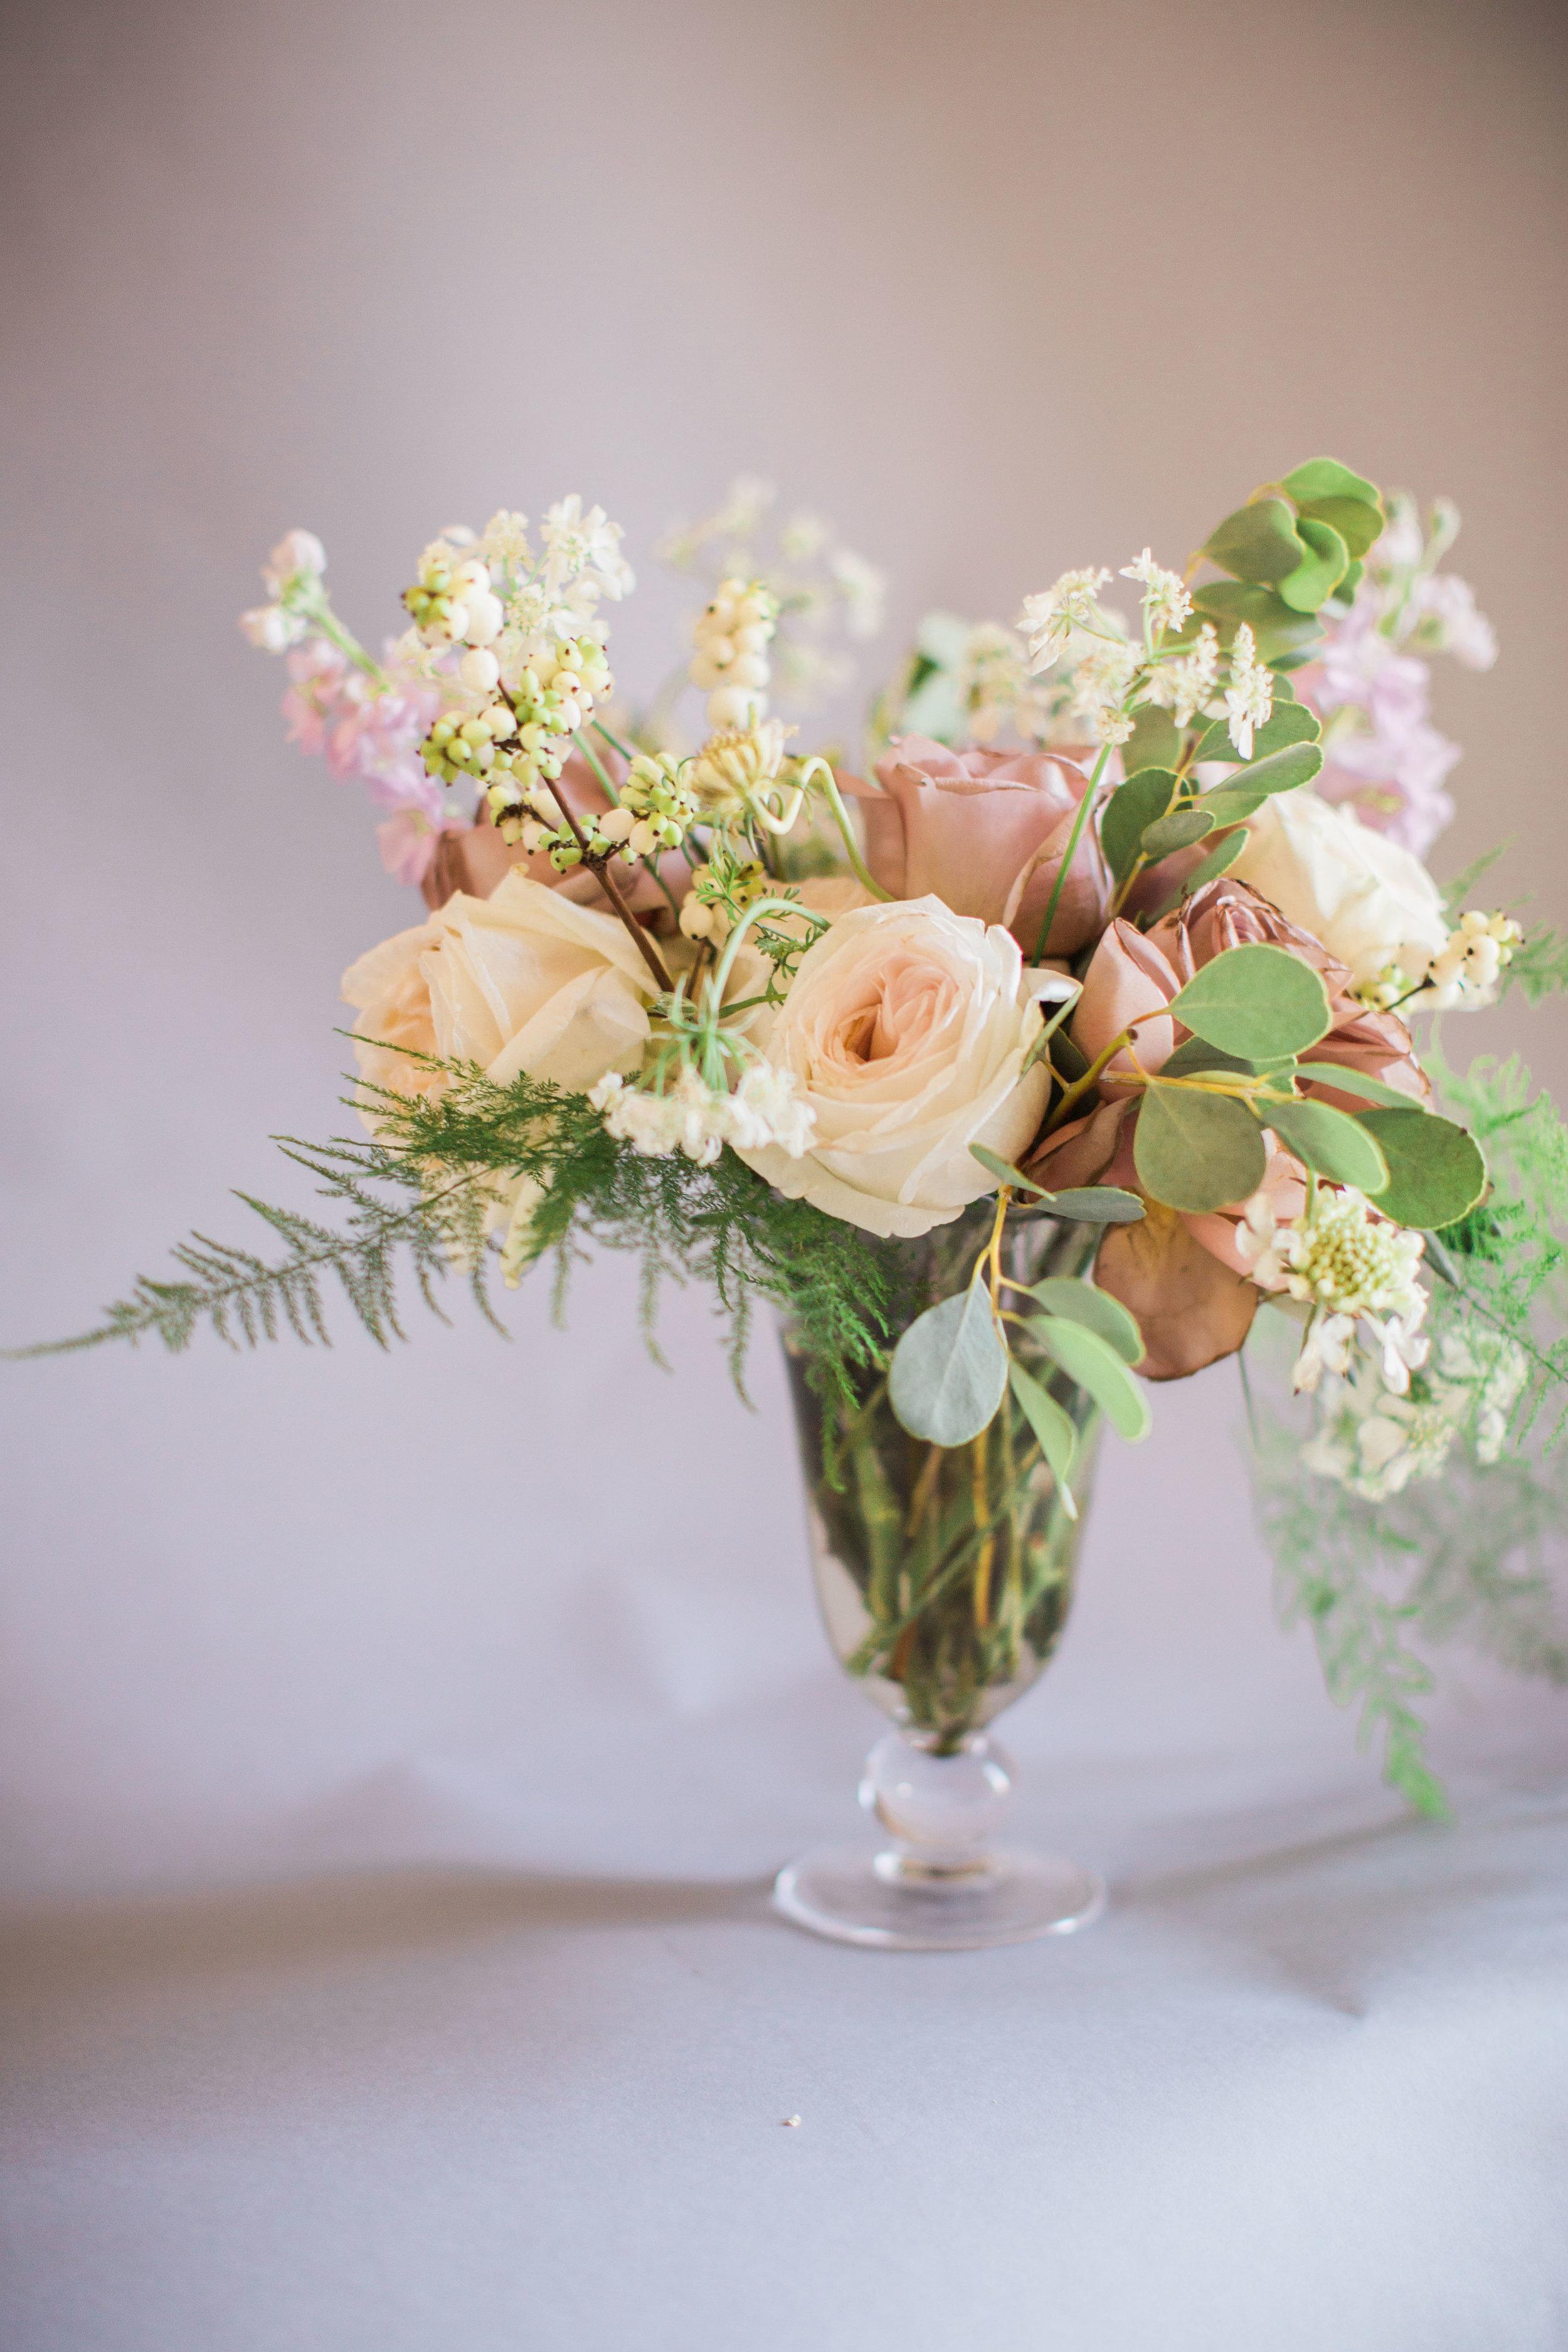 Fine-art-lavender-purple-garden-style-arrangment-lovely-soiree-floral-designs-houston-texas